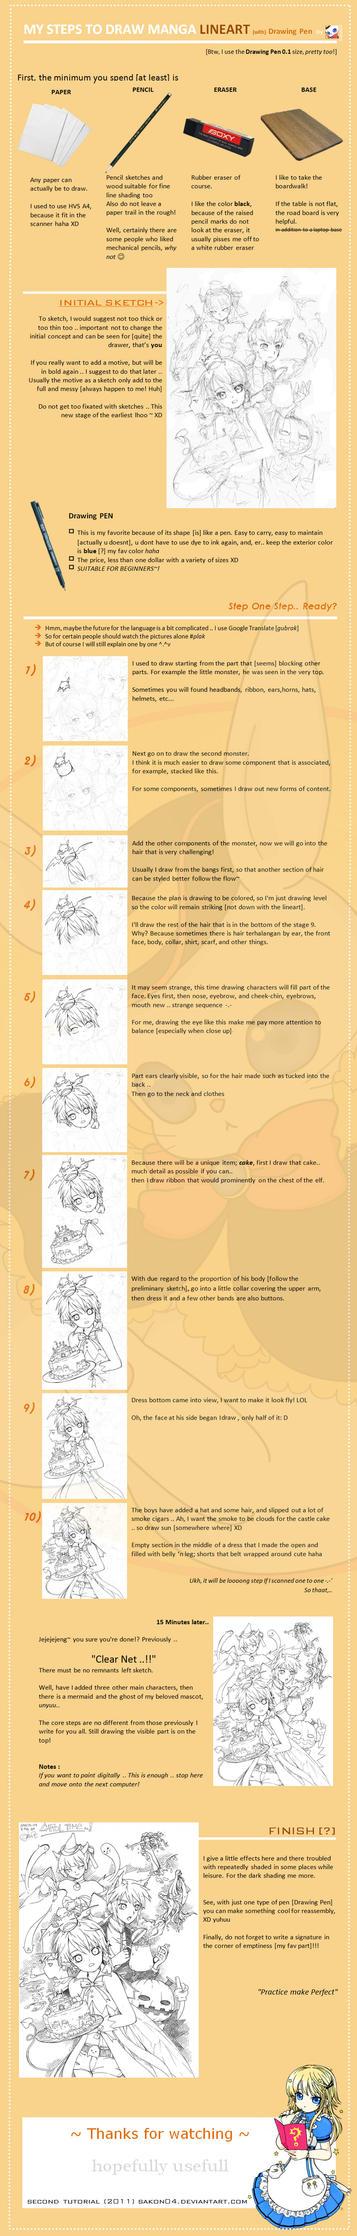 LineArt Manga Tutorial Steps by Sakon04